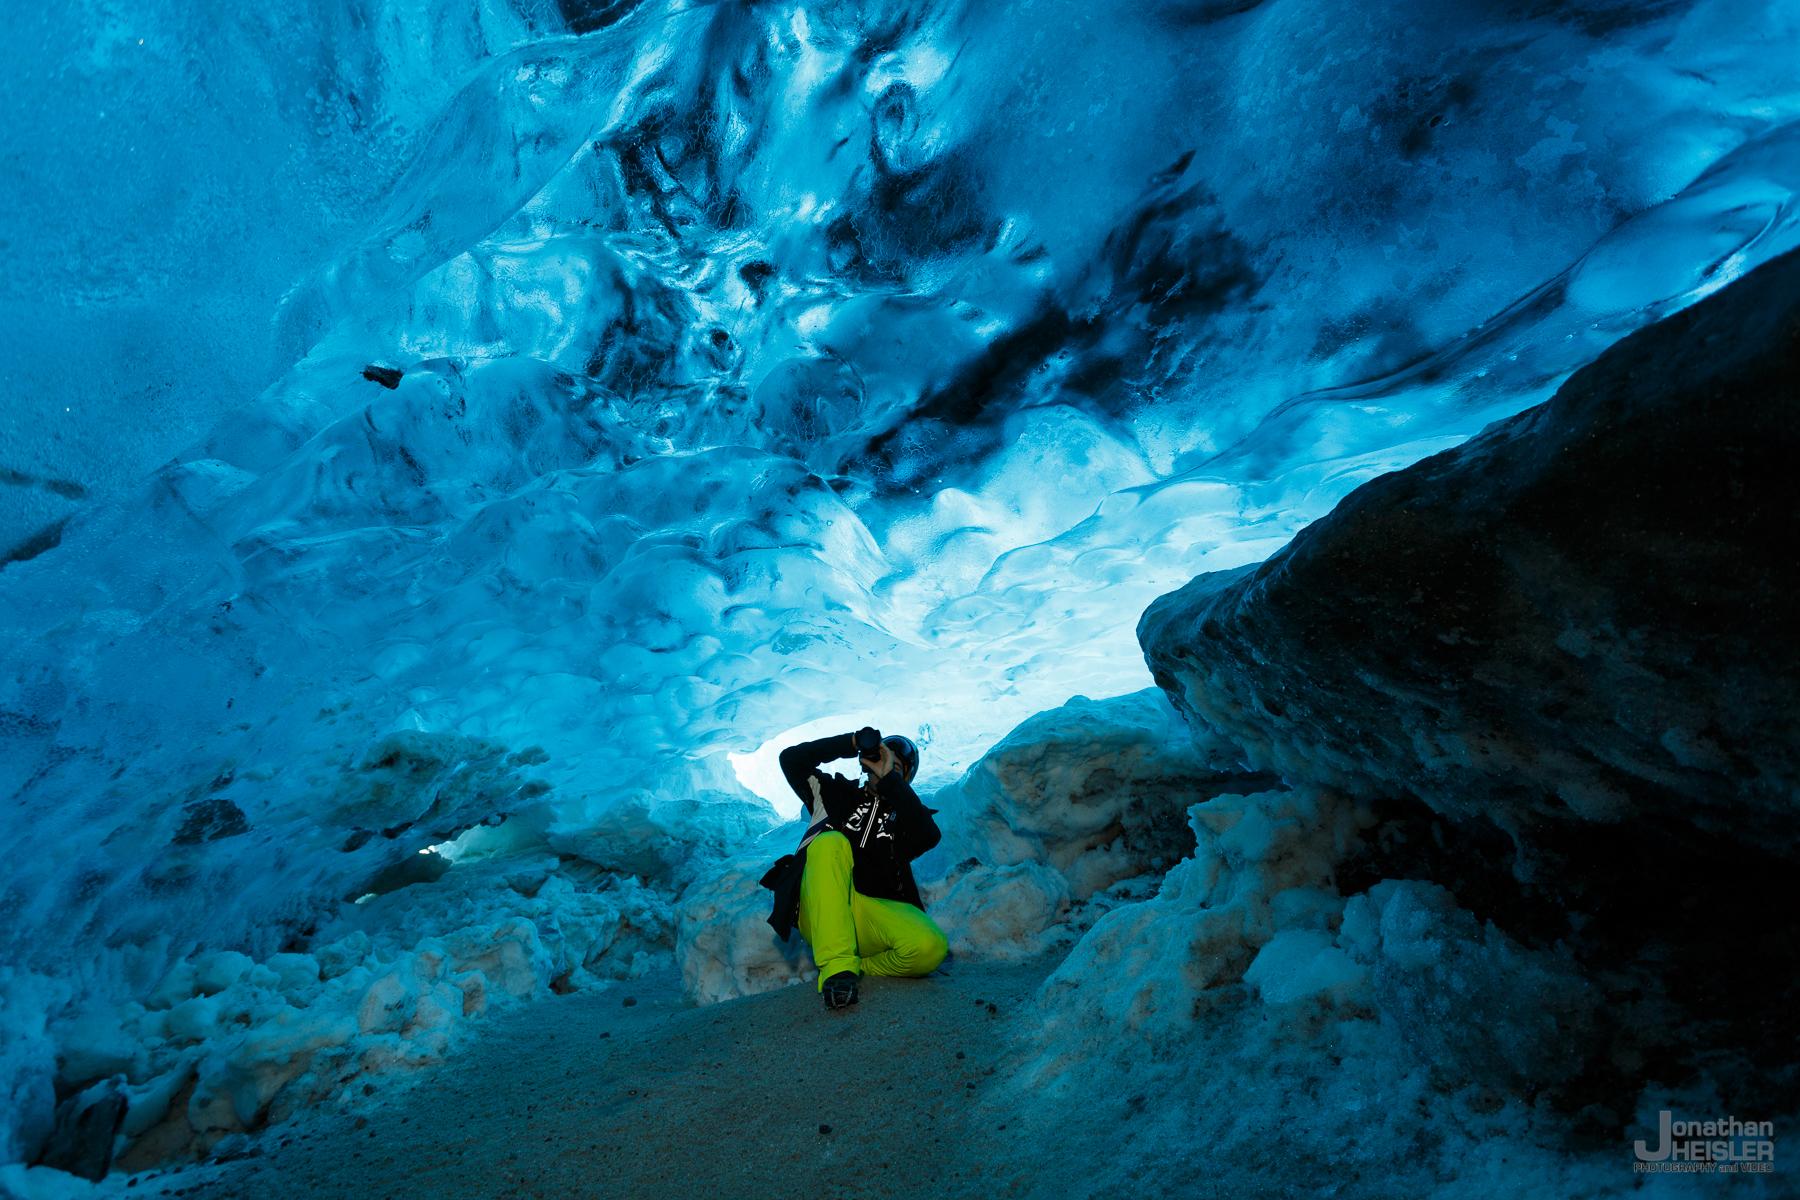 Iceland Winter Photos_  Jonathan Heisler __  02292016 _ 010.jpg